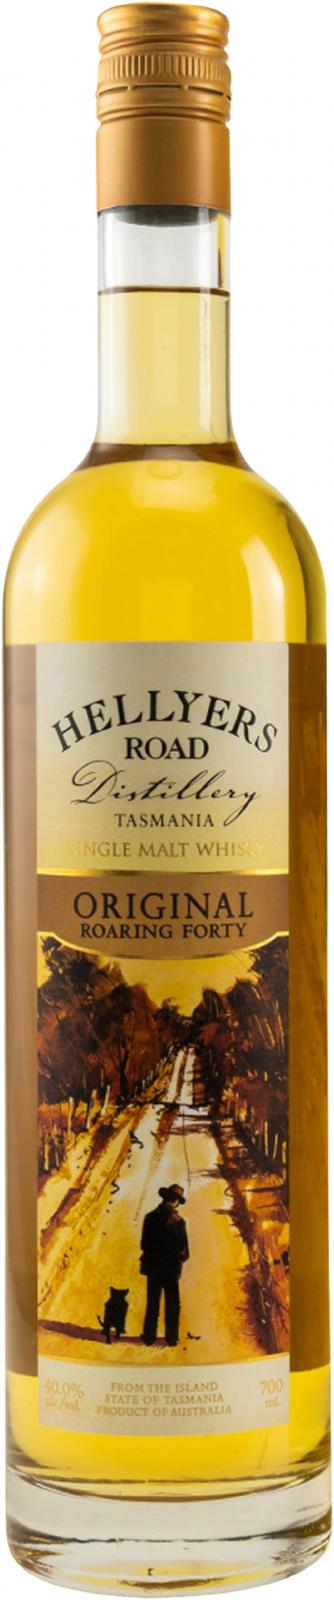 Hellyers Road Original - Roaring Forty